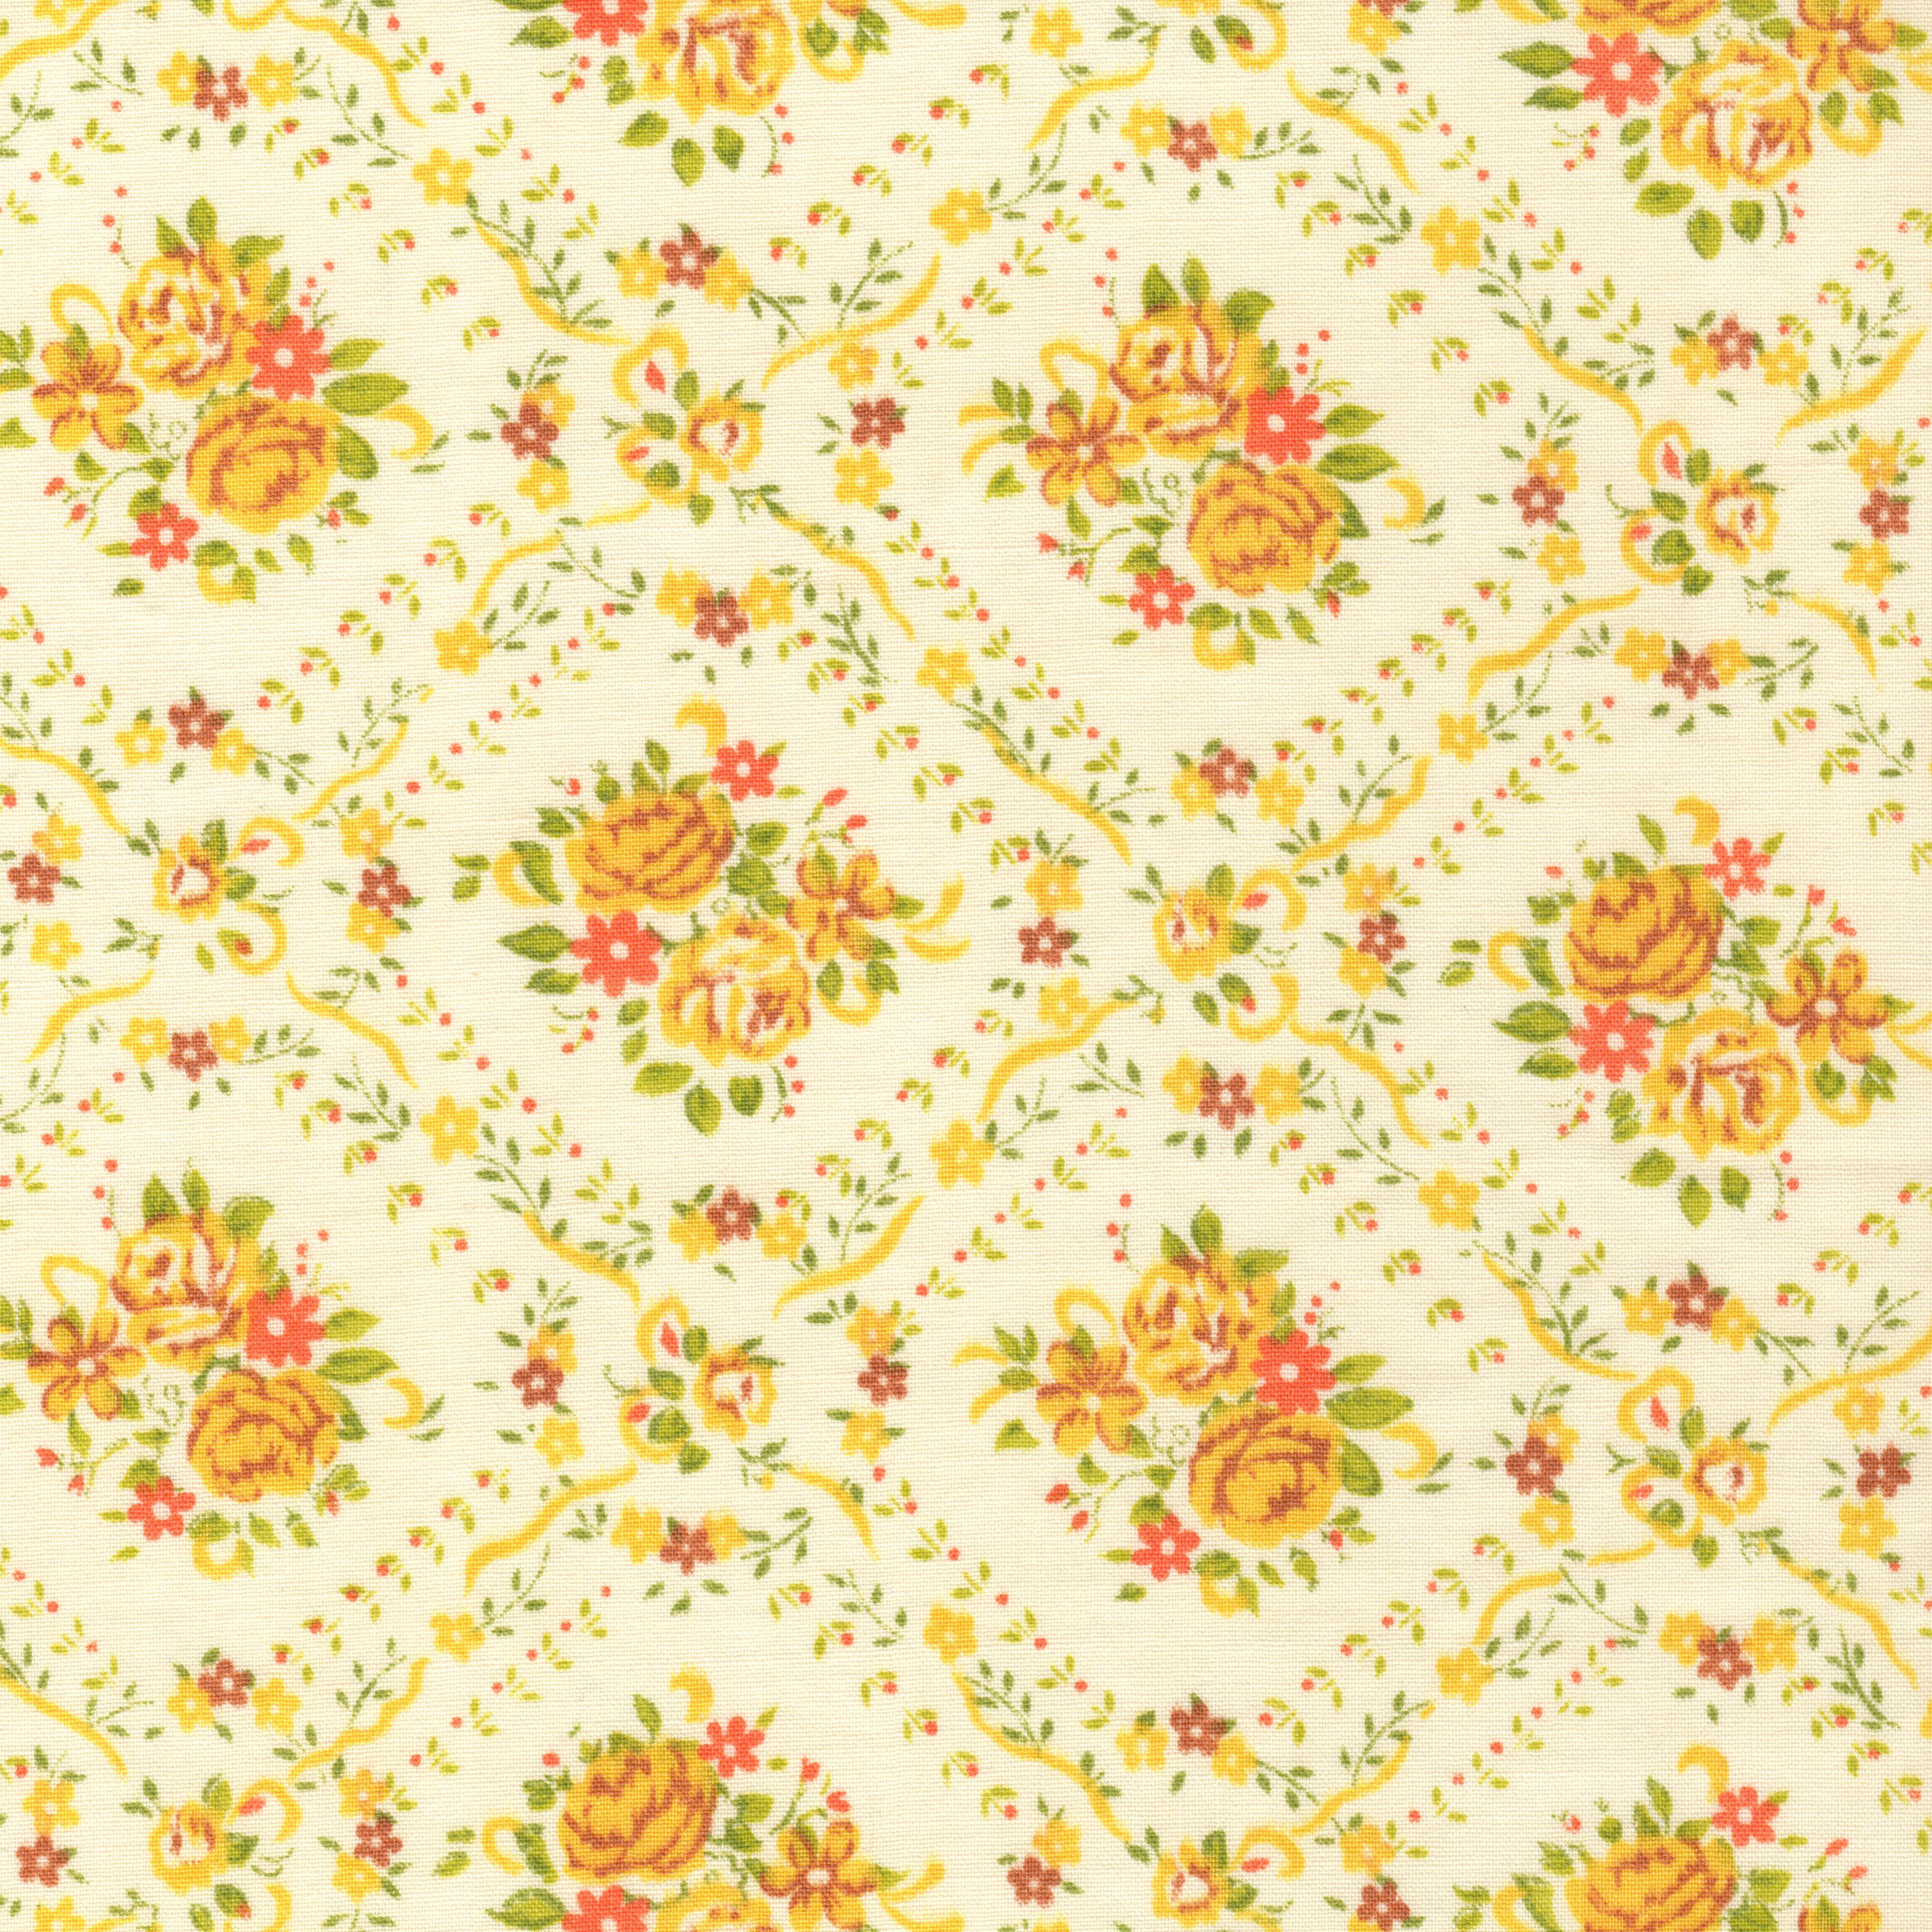 Paper: Free Floral Autumn 12 X 12 Digital Scrapbooking - Free Pretty - Free Printable Autumn Paper